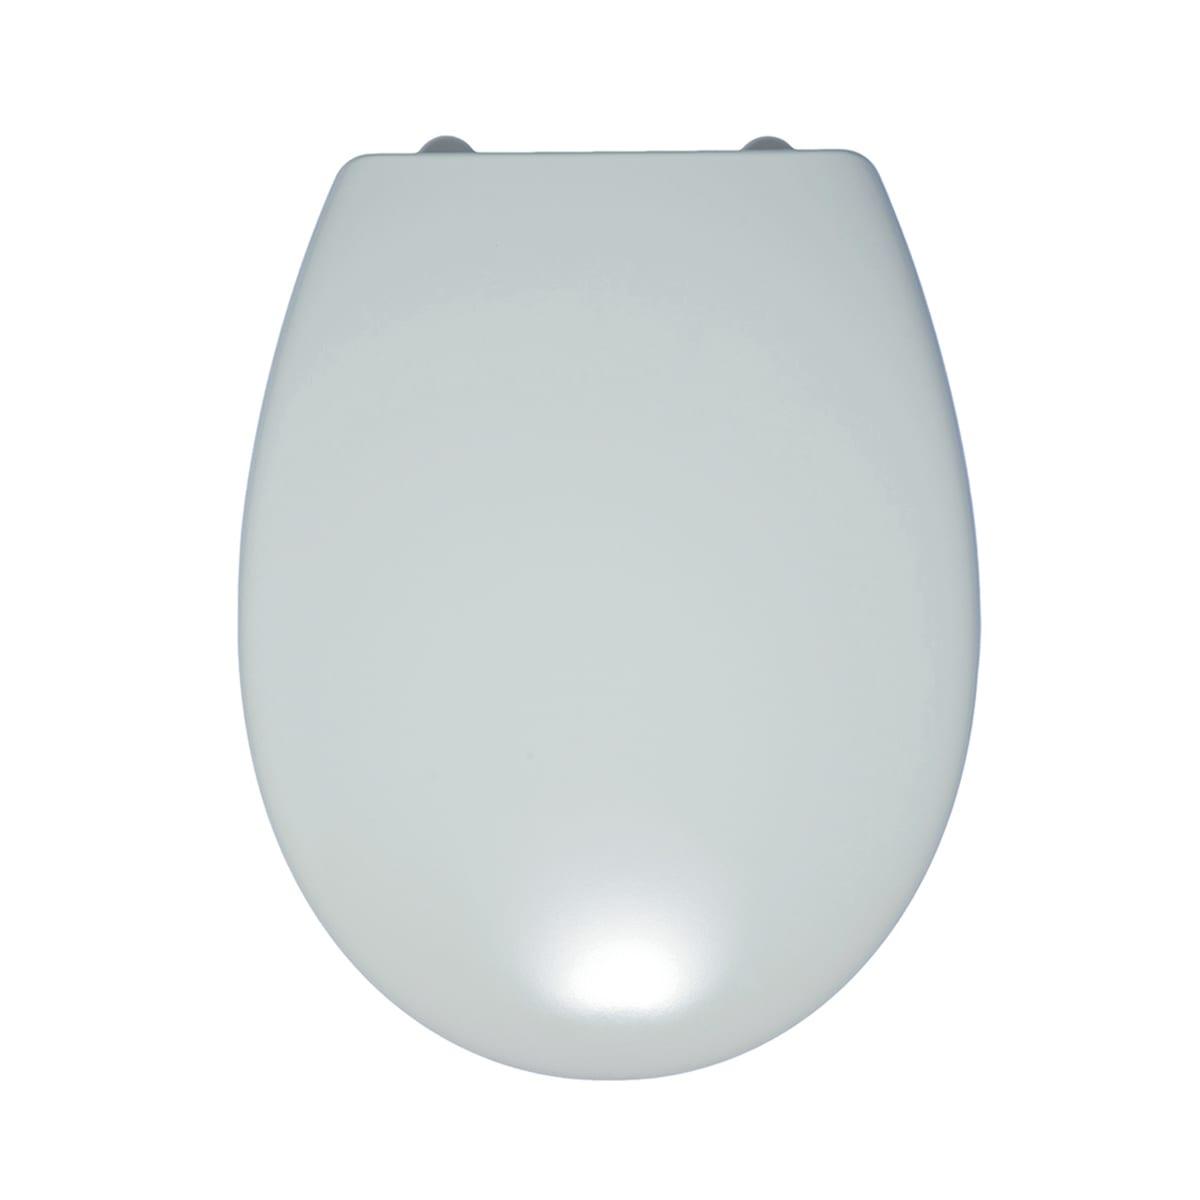 Vaso Ceramica Dolomite Miky.Copriwater Ovale Miky New Bianco